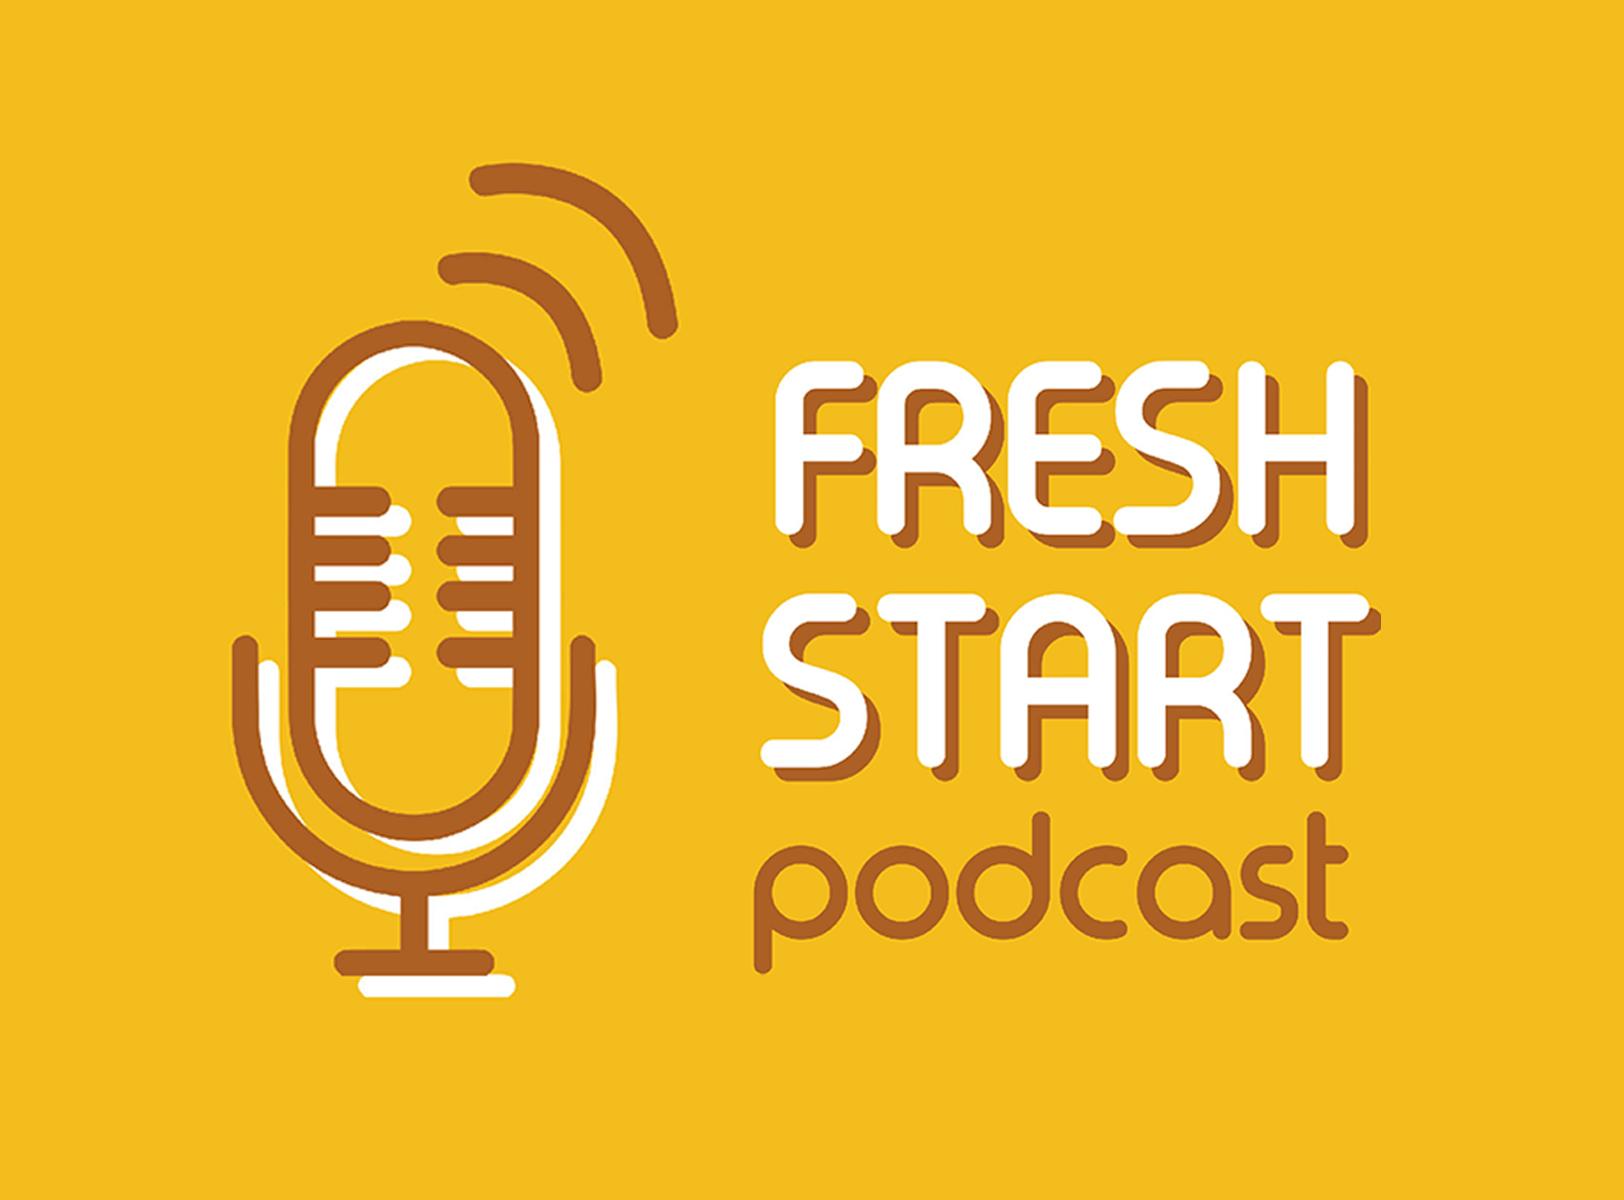 Fresh Start: Podcast News (06/17/2019 Mon.)